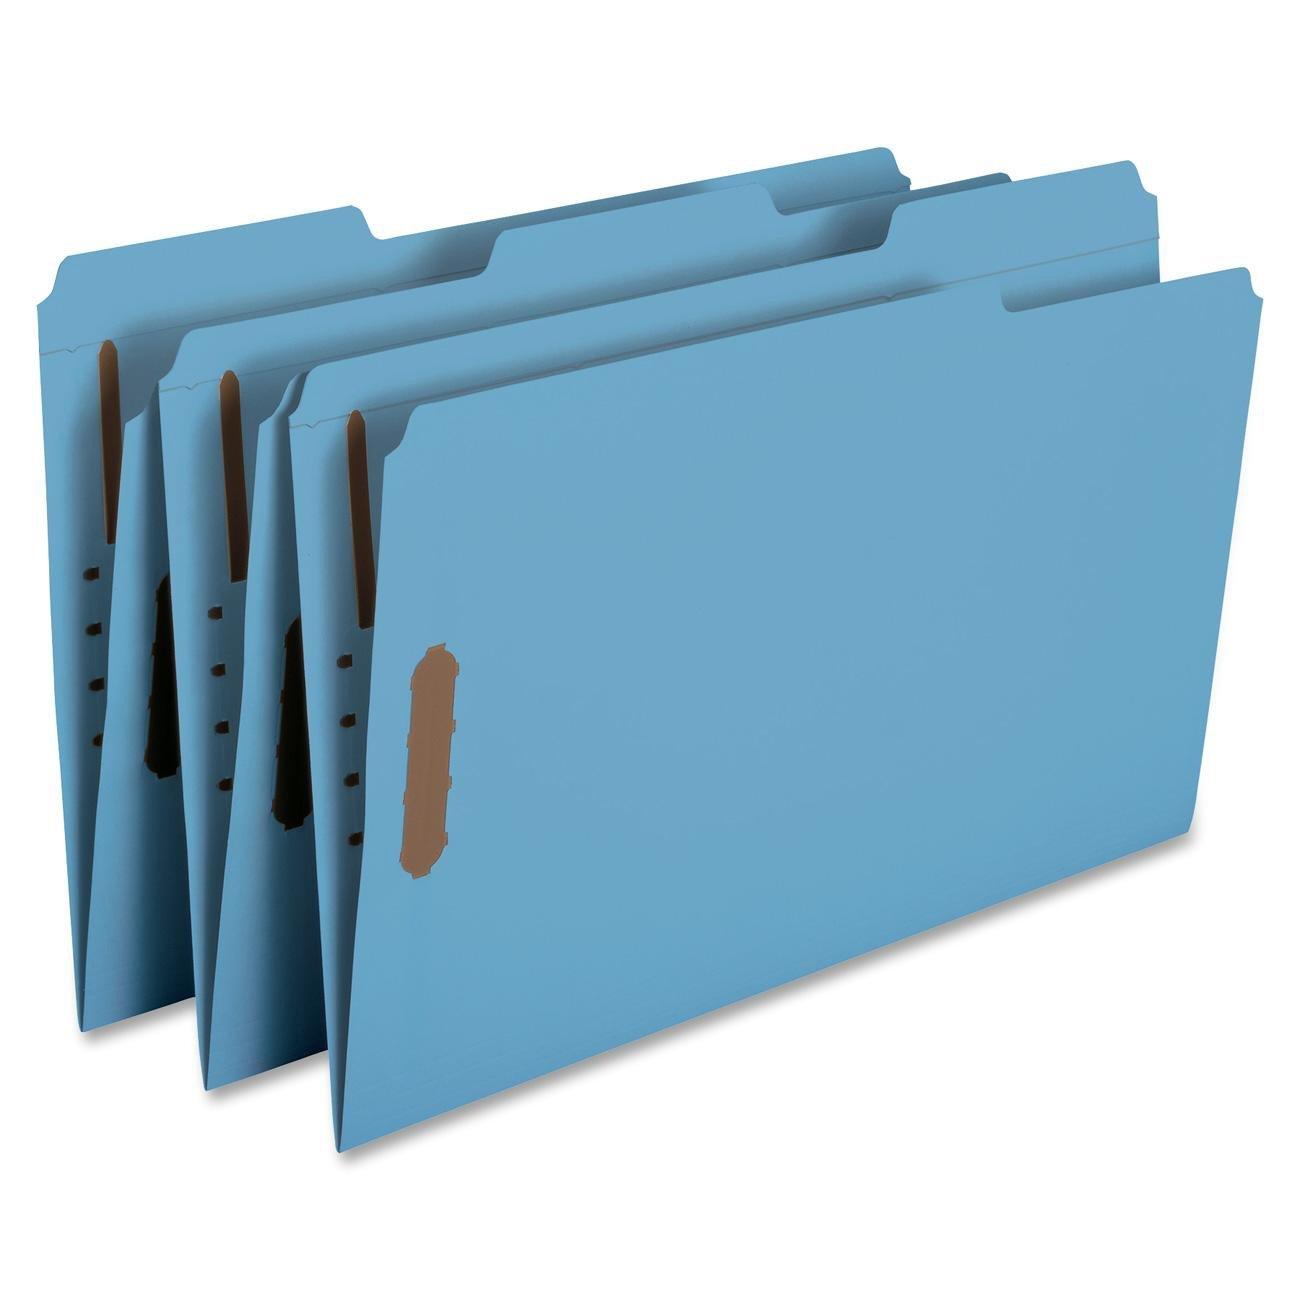 Smead Fastener File Folder, 2 Fasteners, Reinforced 1/3-Cut Tab, Legal Size, Blue, 50 per Box (17040)